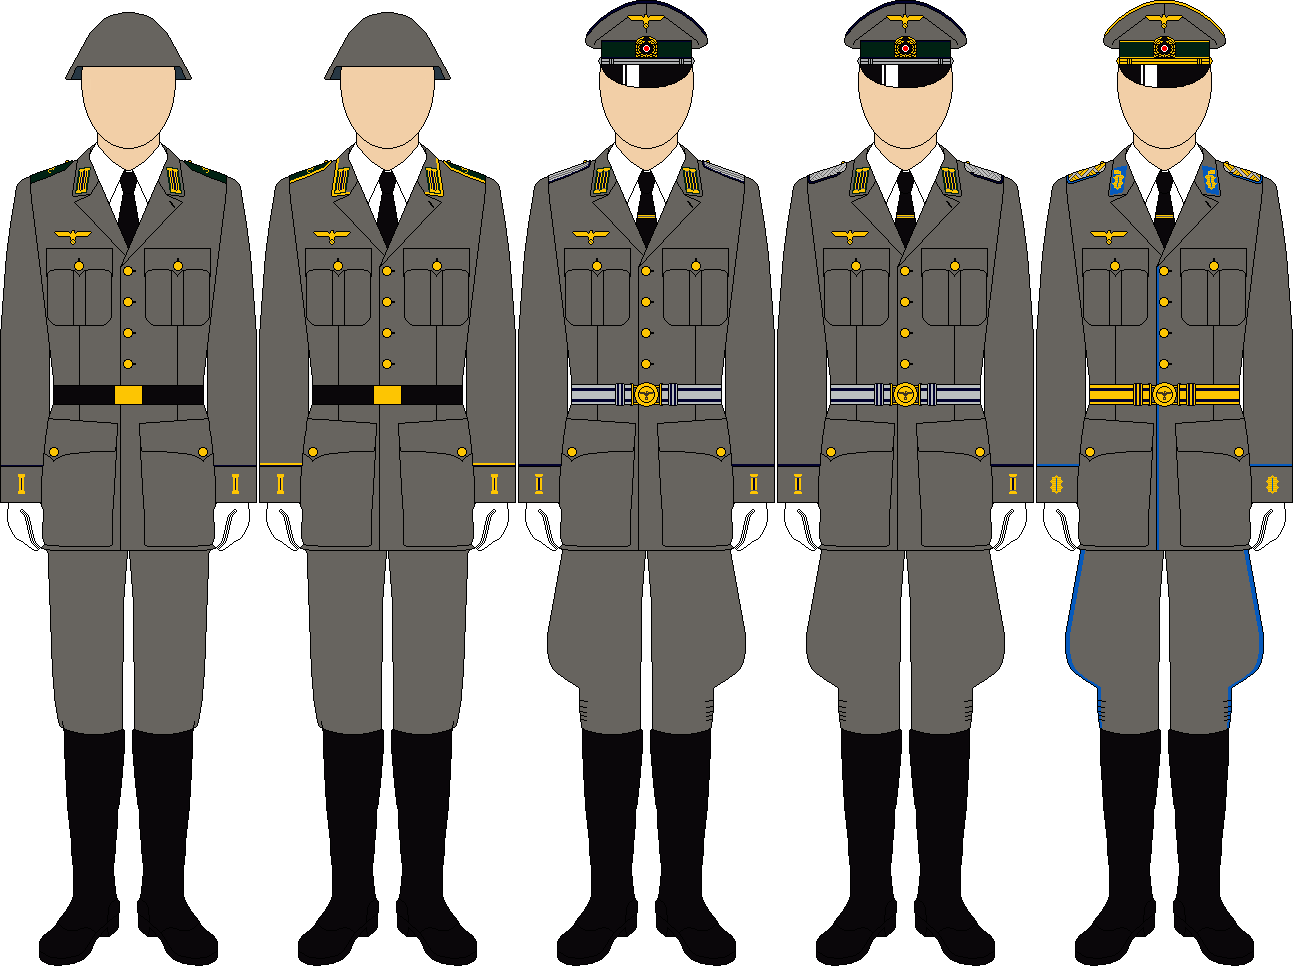 Kriegsmarine coastal service parade dress by thefalconette-d5cyckq